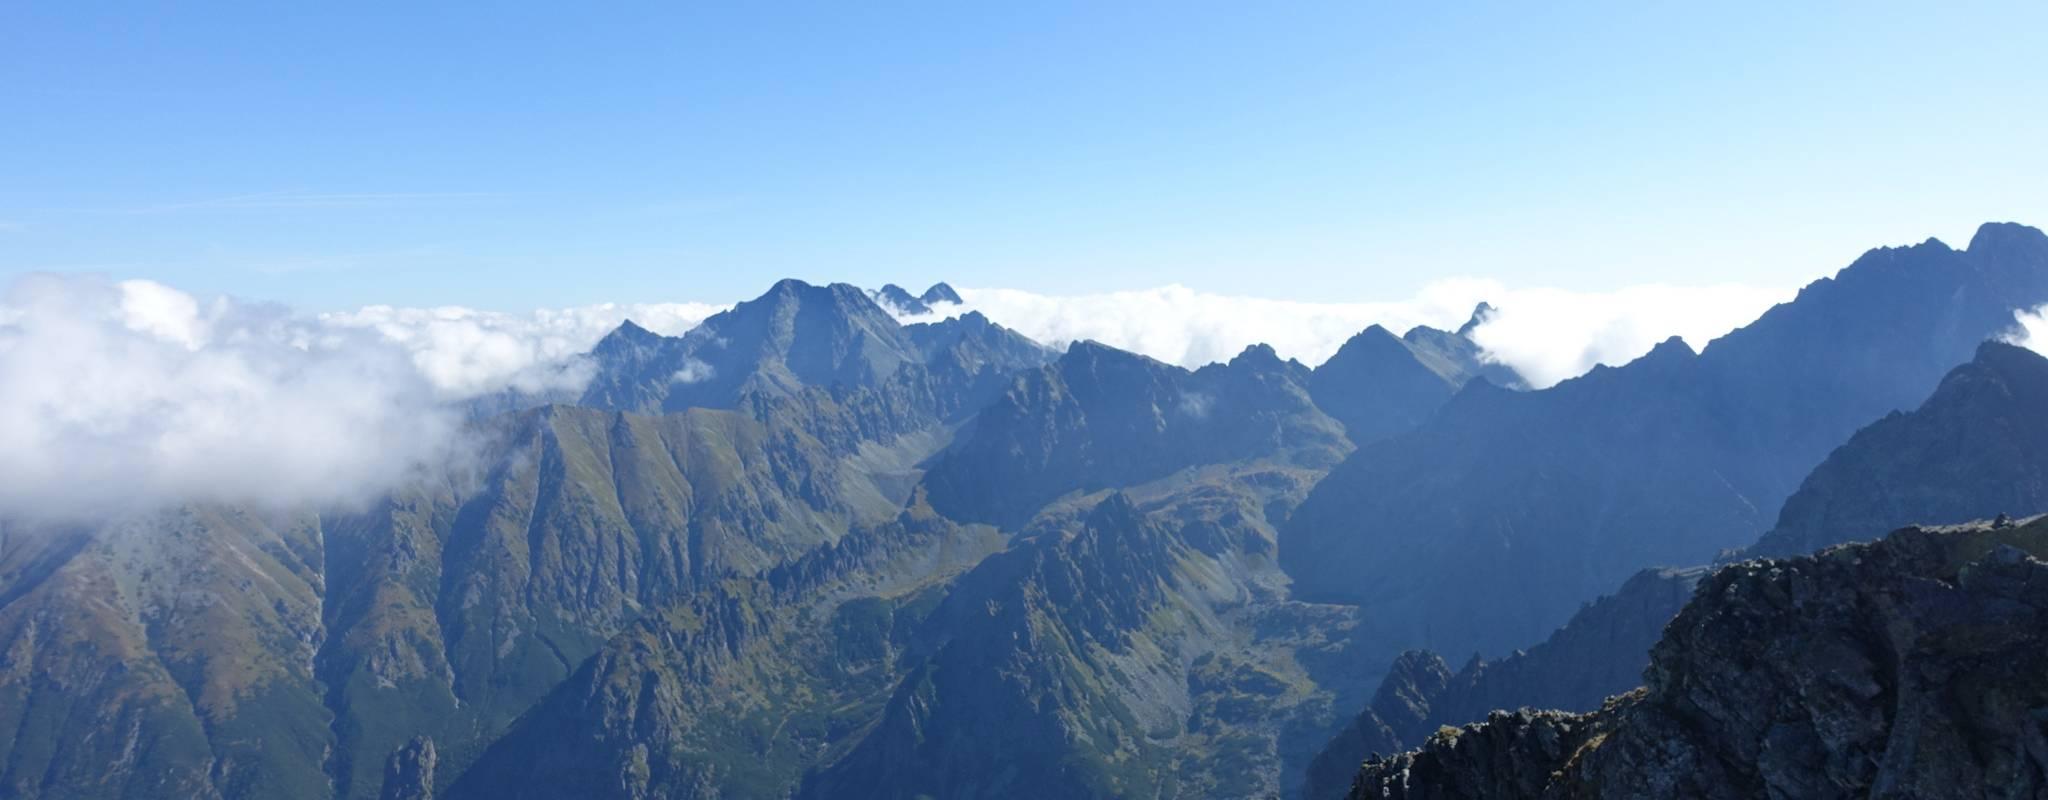 Panorama vom Rysy nach Osten. Foto: Martin Heppner